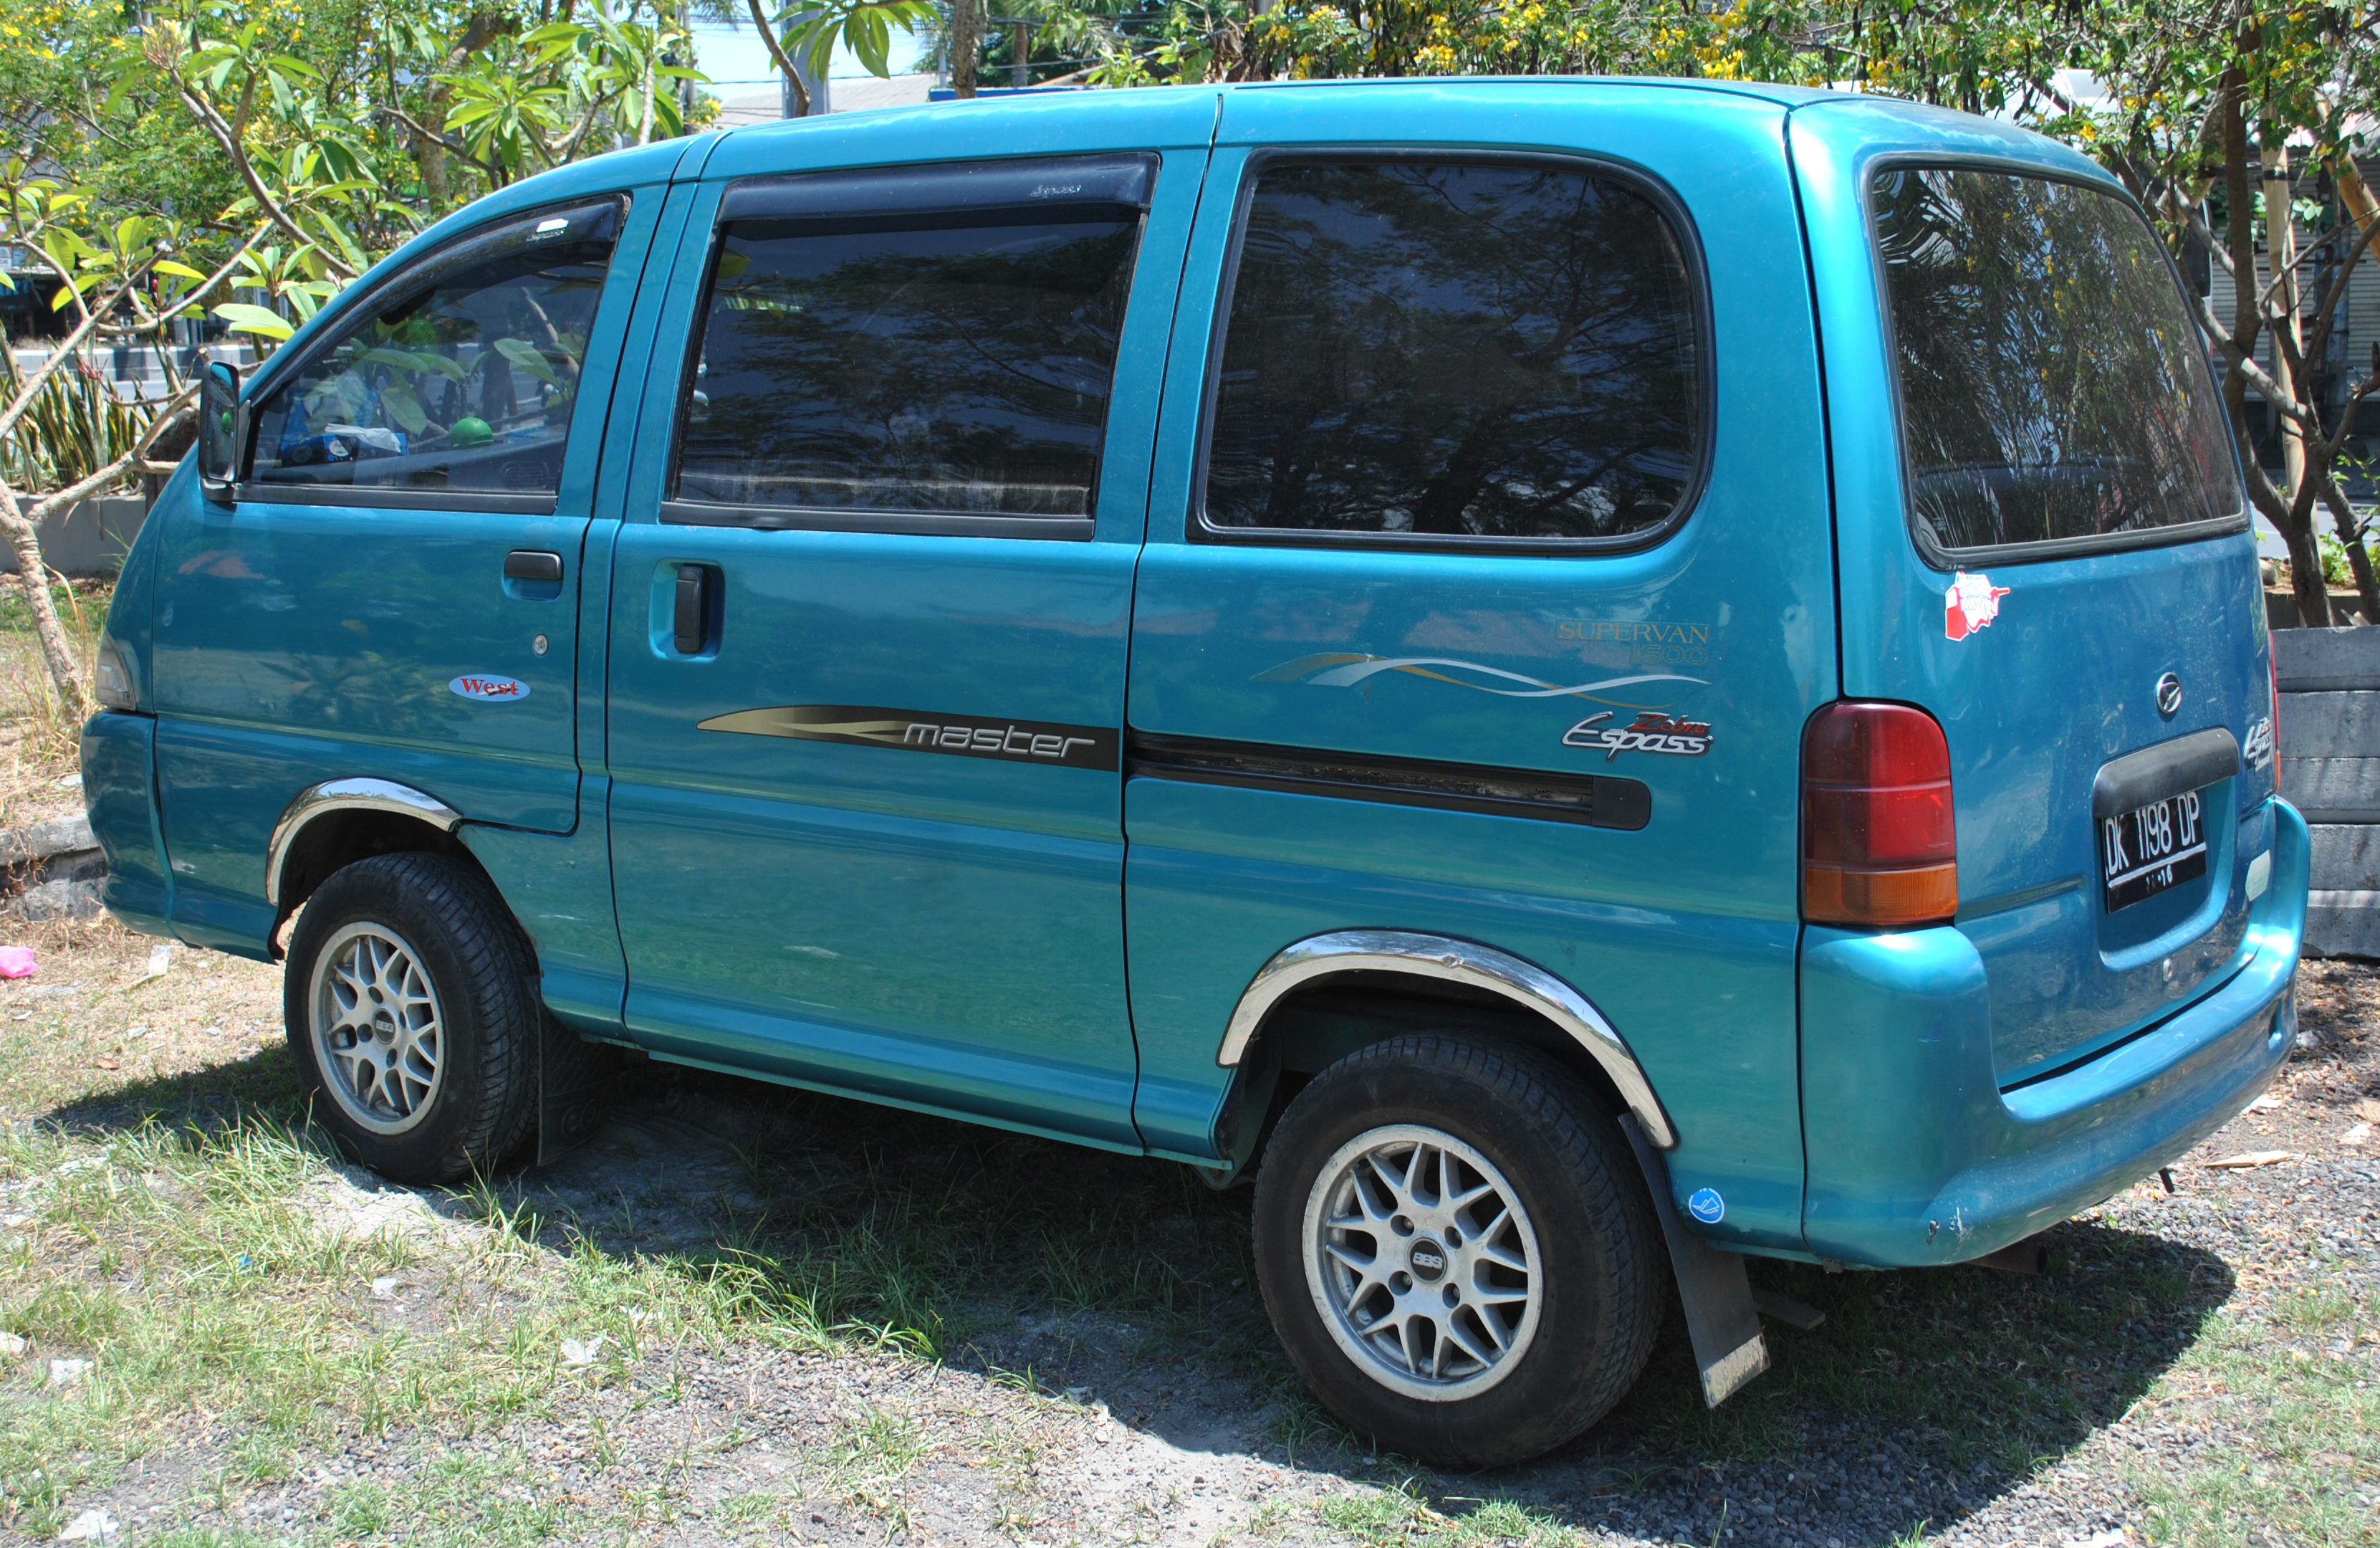 File:Daihatsu Zebra Espass rear.jpg - Wikimedia Commons